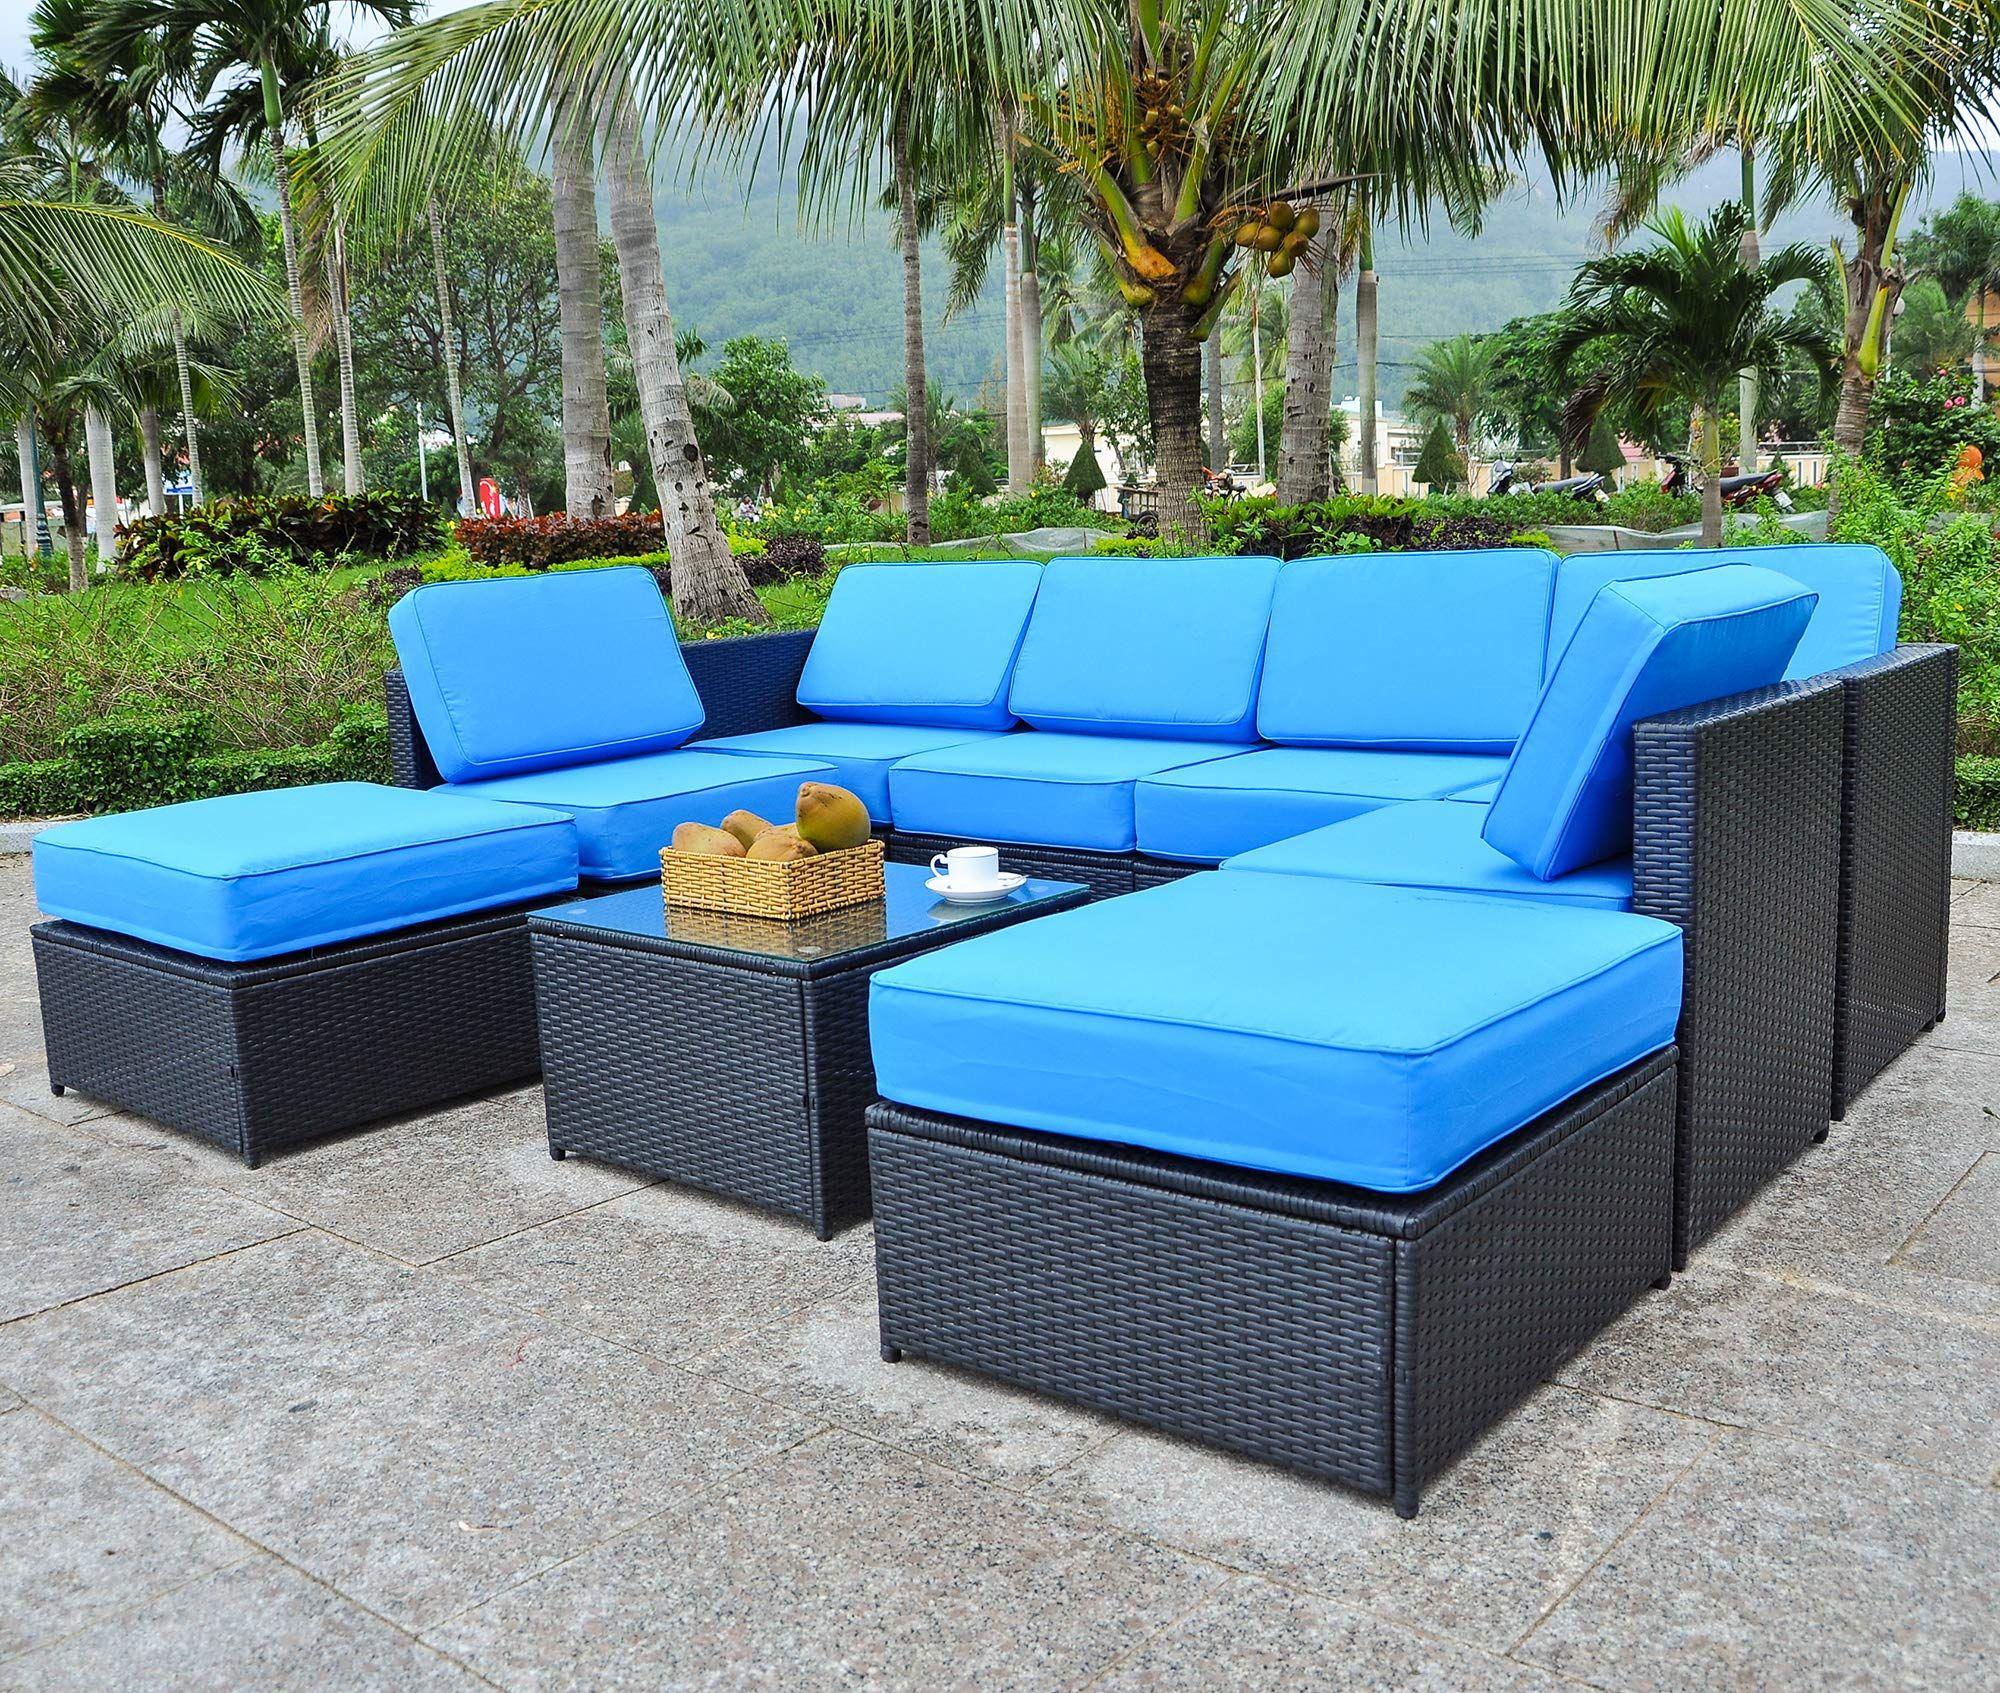 Full Size of Rattan Corner Sofa Cover Wilko Cushions Replacements Outdoor Uk Set For Sale Davao Boxspring Mit Schlaffunktion Antik Bora W Schillig Modulares Lederpflege Sofa Rattan Sofa